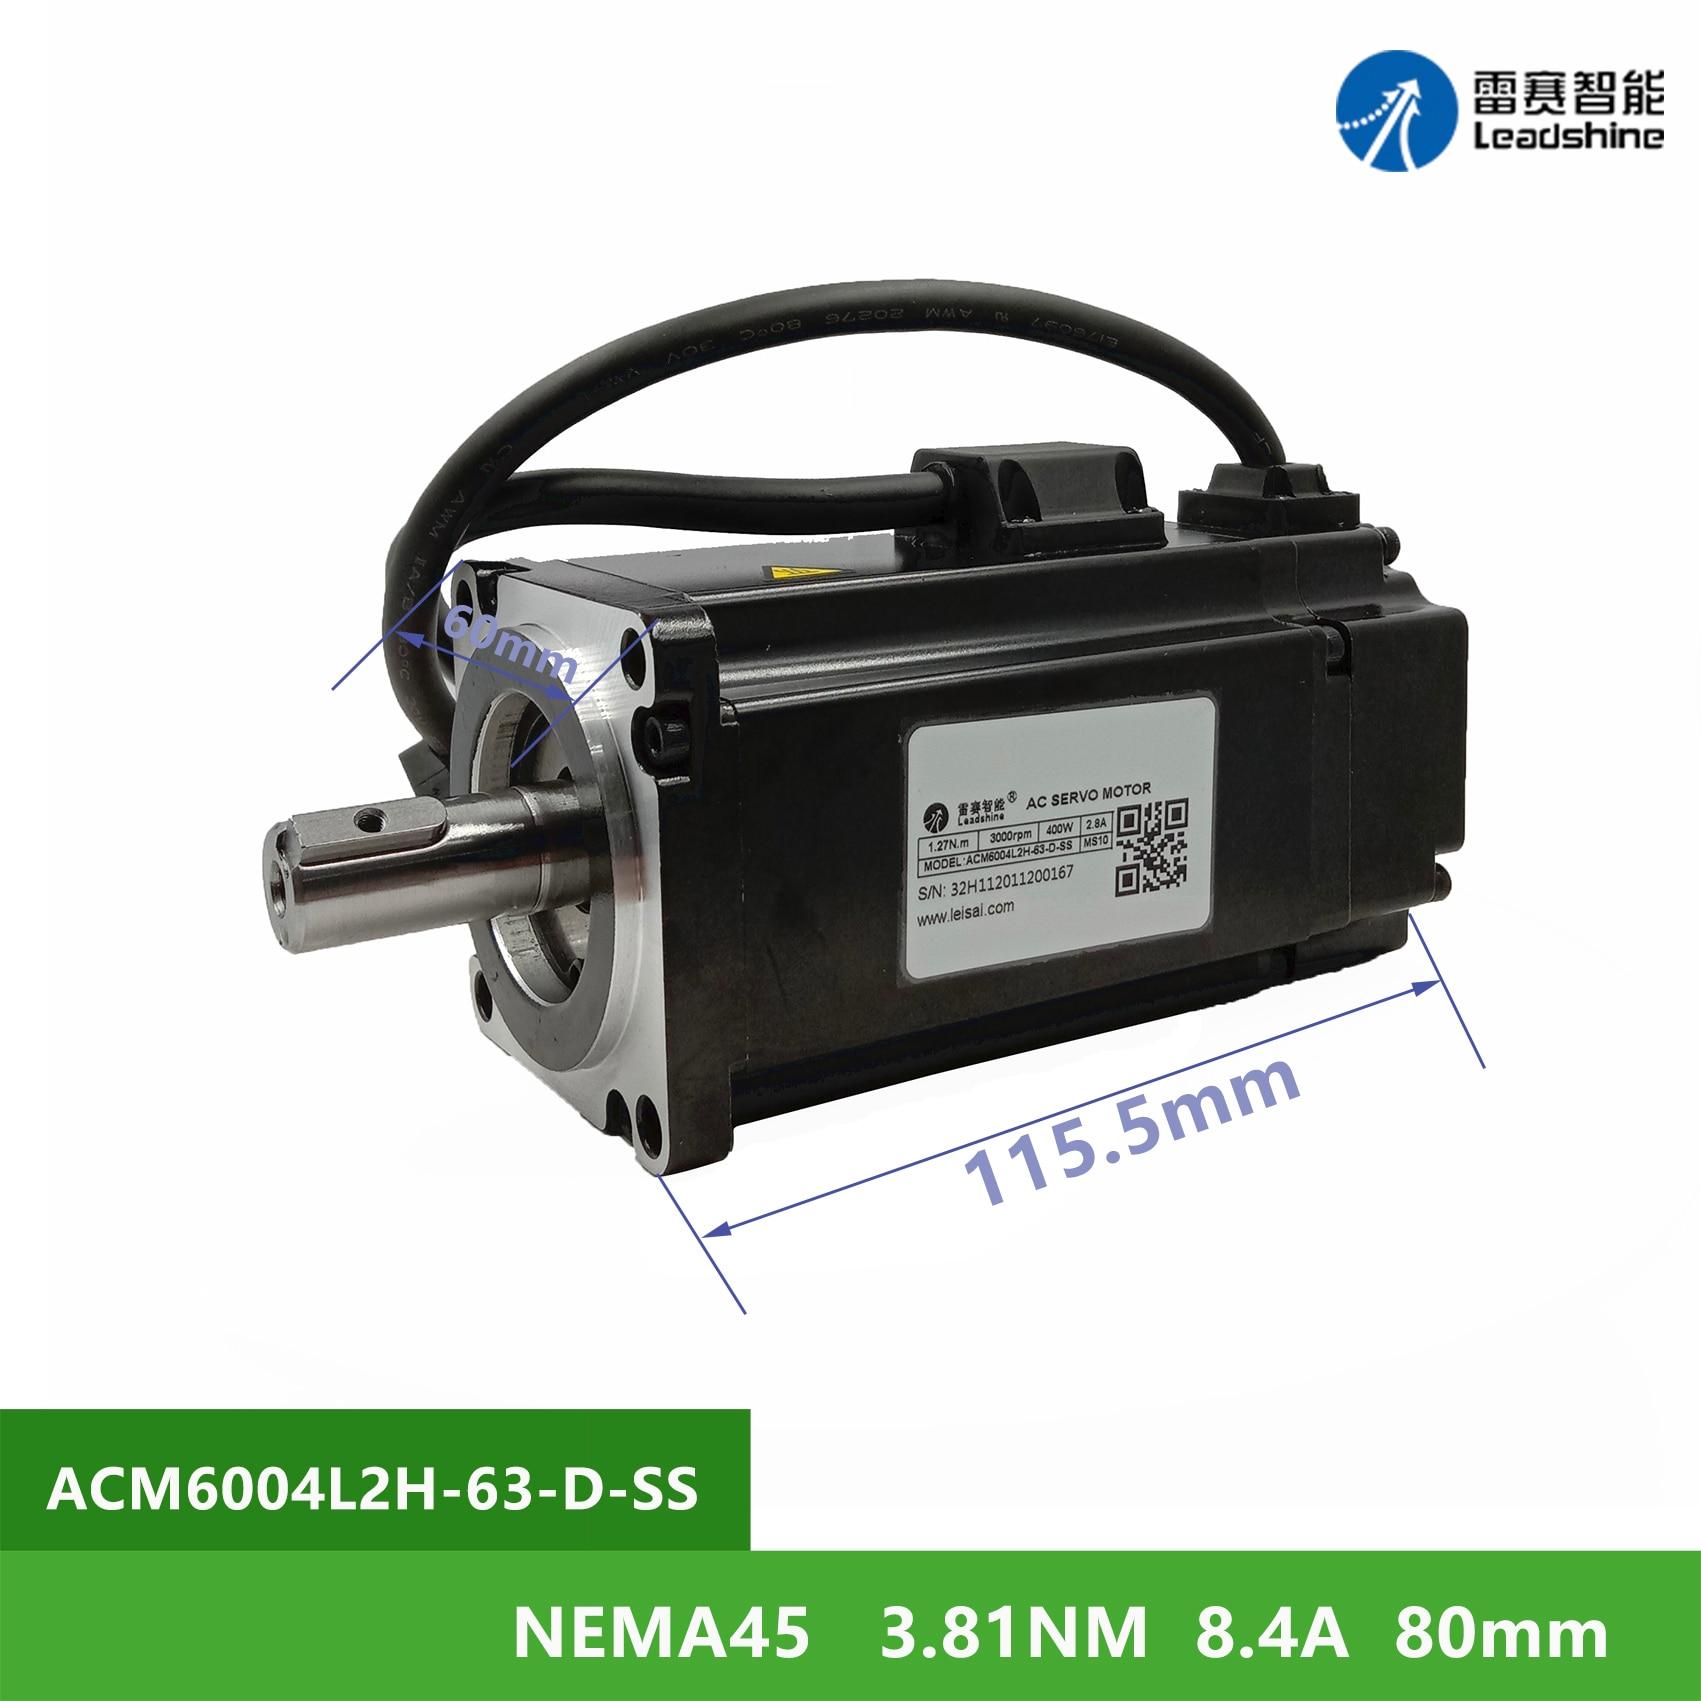 NEMA45 Leadshine ACM6004L2H-63-D-SS 3.81Nm 8.4A عالية الجهد محرك مؤازر 2 المرحلة رمح القطر 14 مللي متر